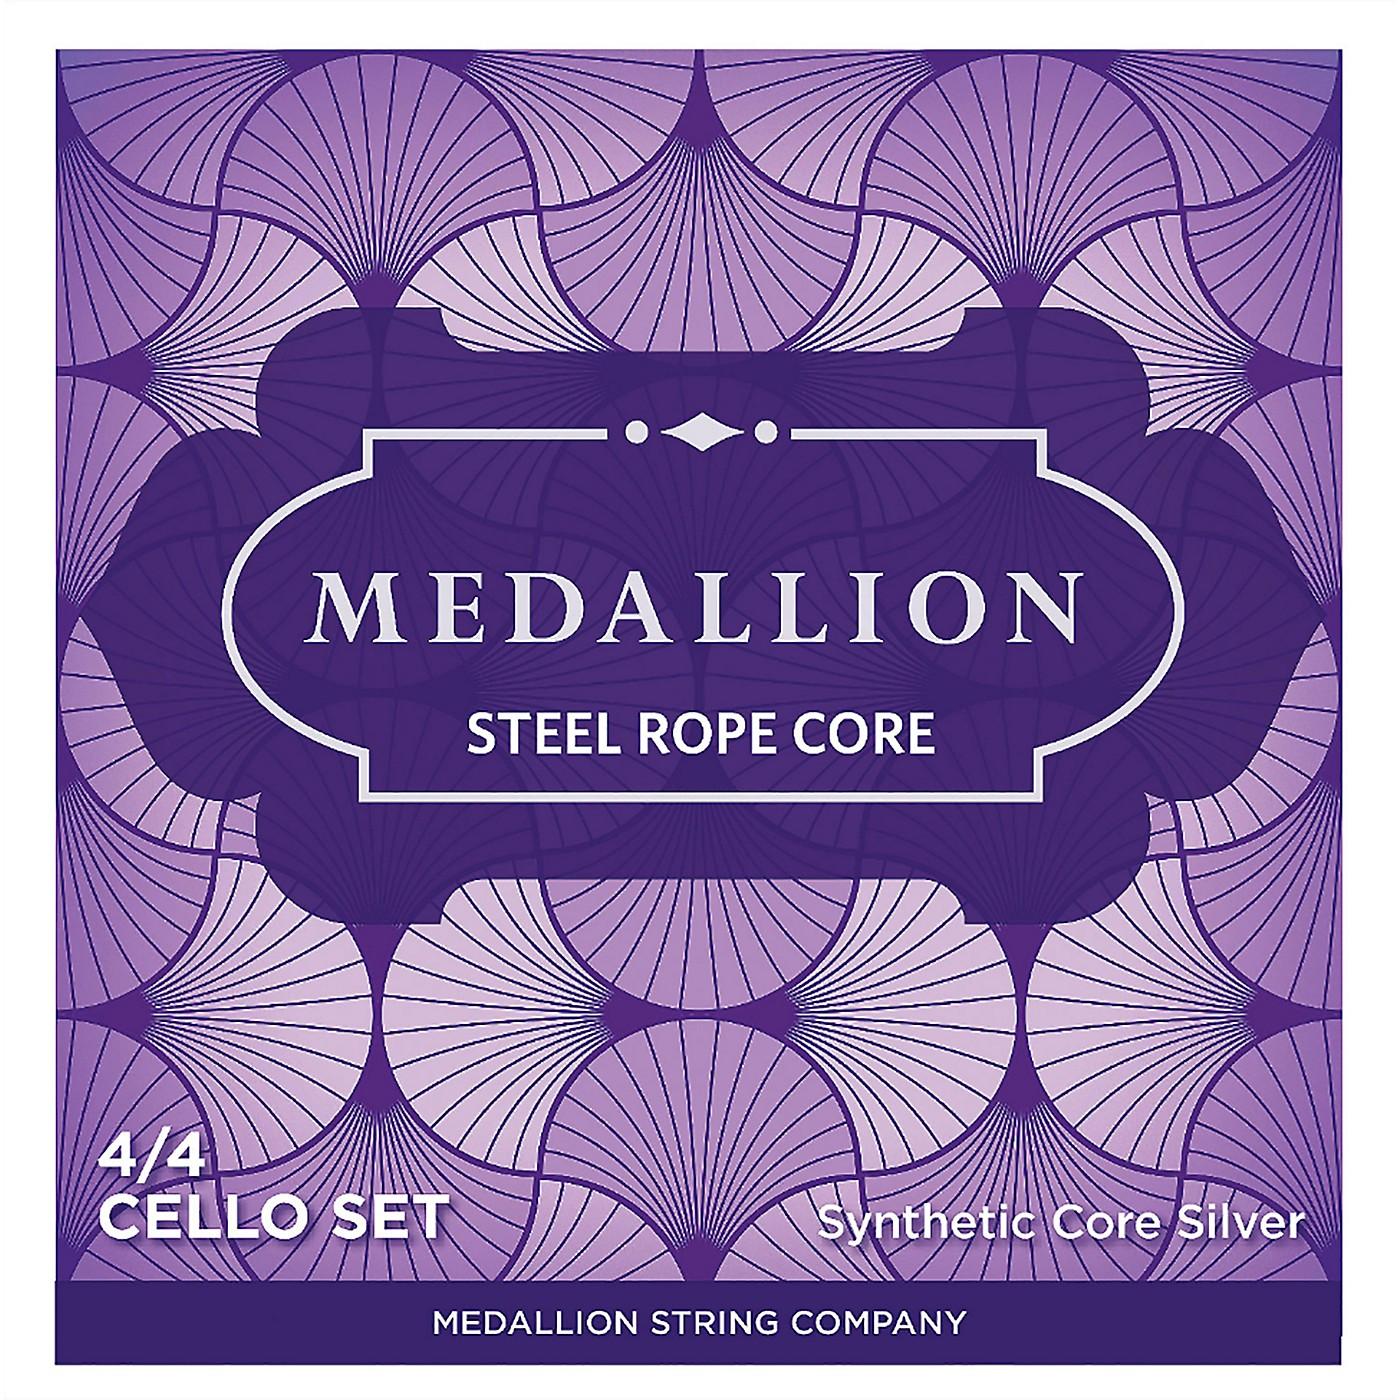 Medallion Strings Ropecore Steel Cello String Set thumbnail